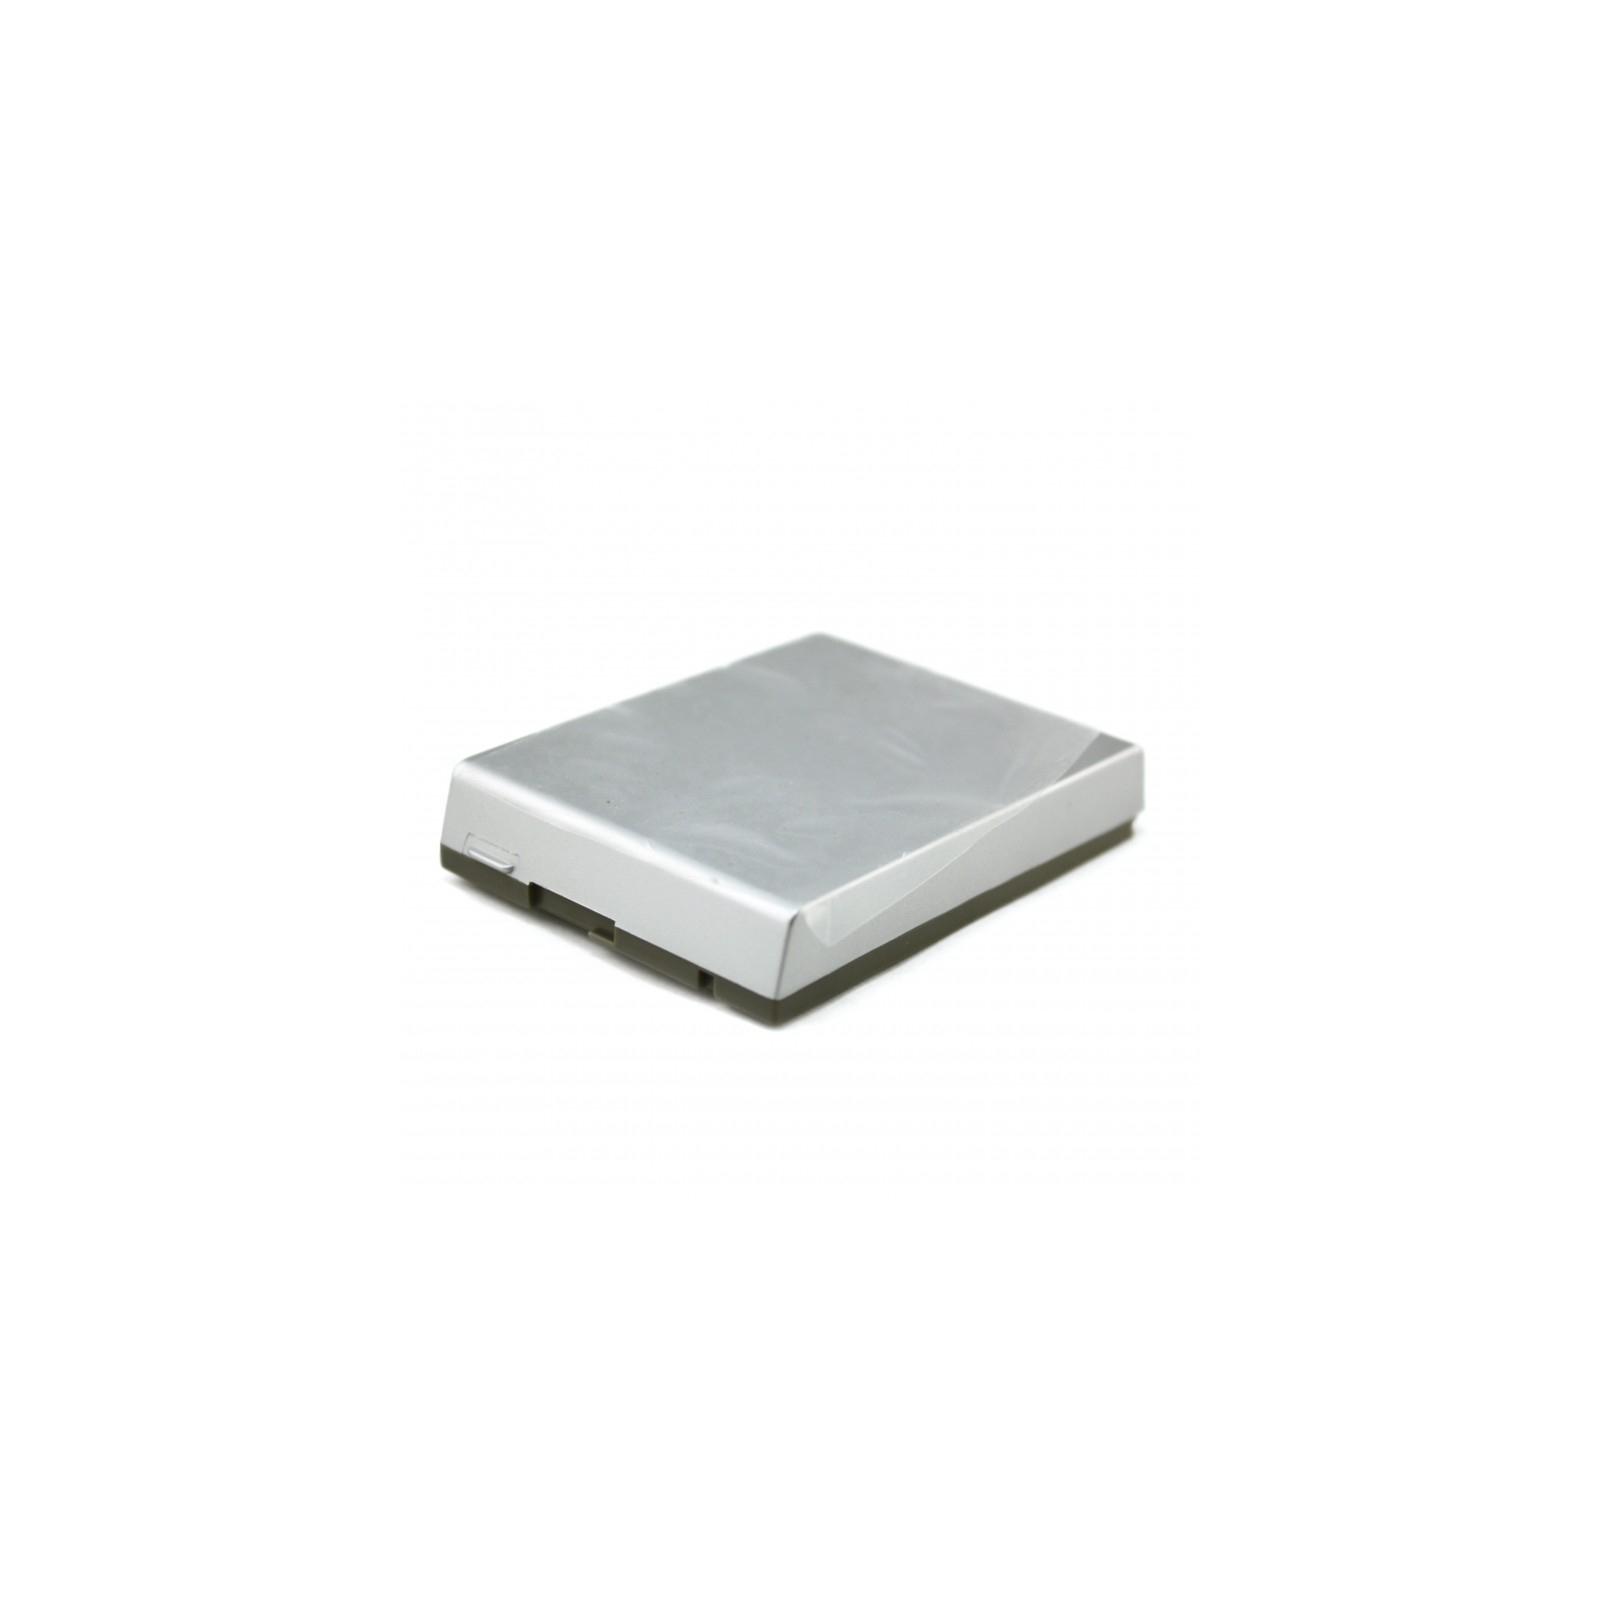 Аккумулятор к фото/видео EXTRADIGITAL JVC BN-V114U (DV00DV1087) изображение 4